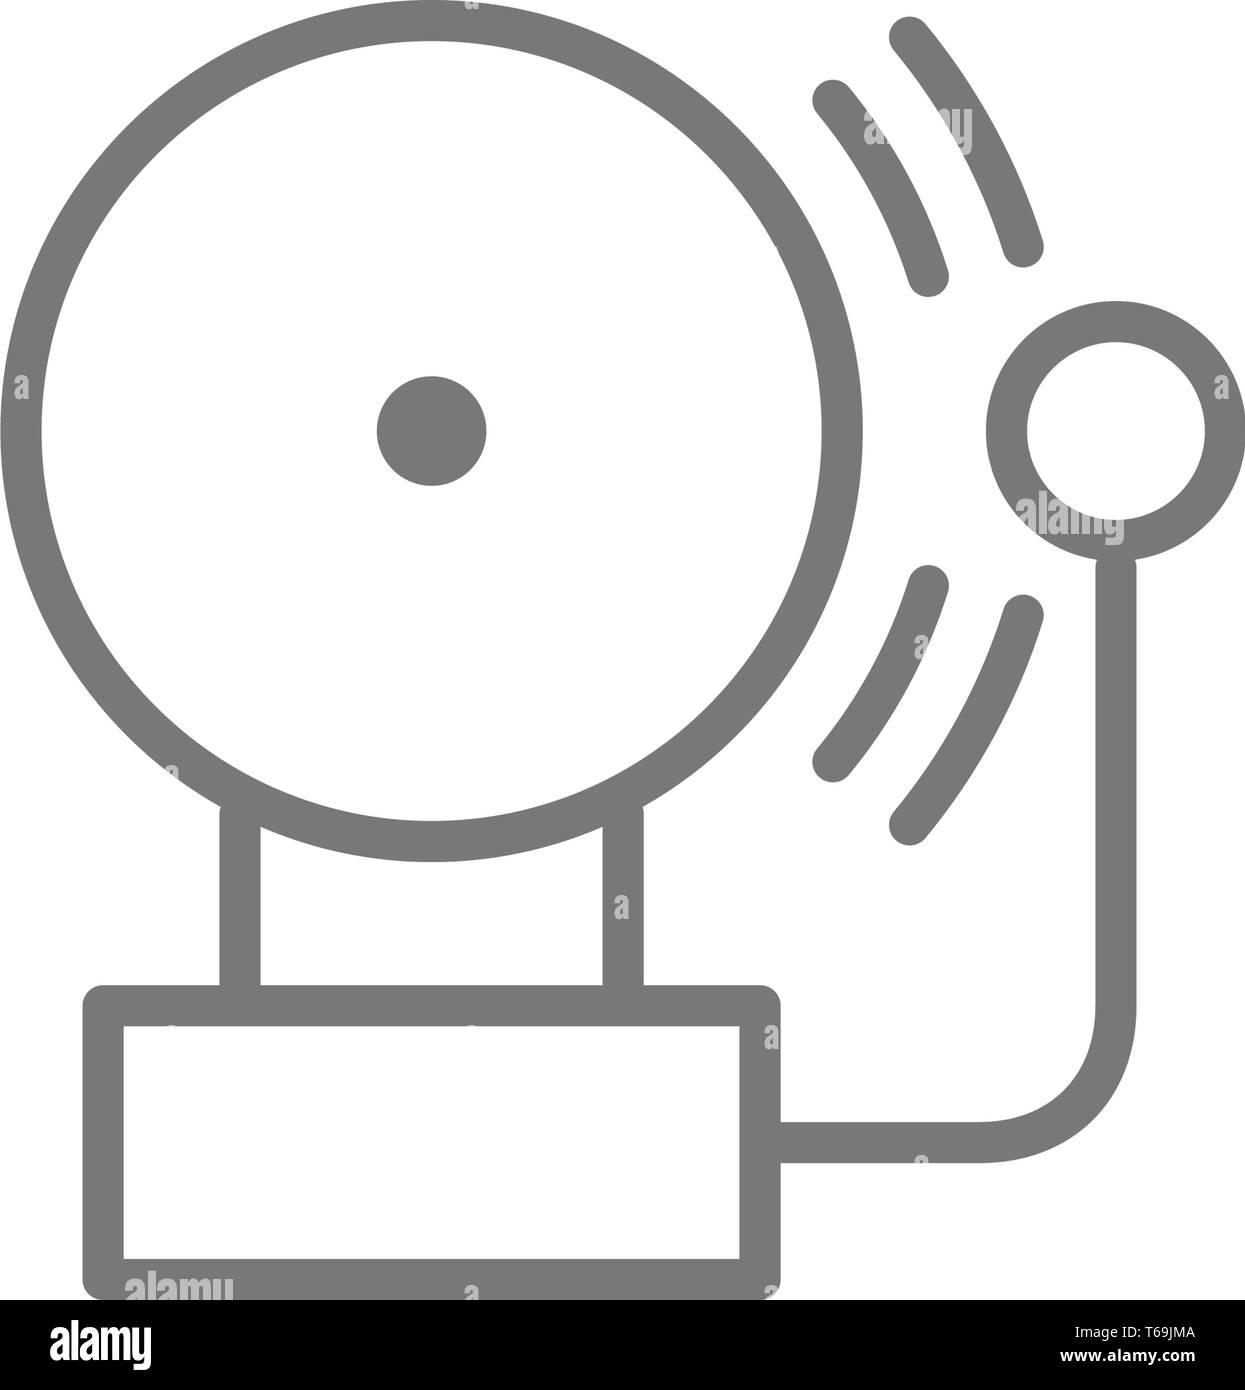 Alarm bell line icon. Stock Vector